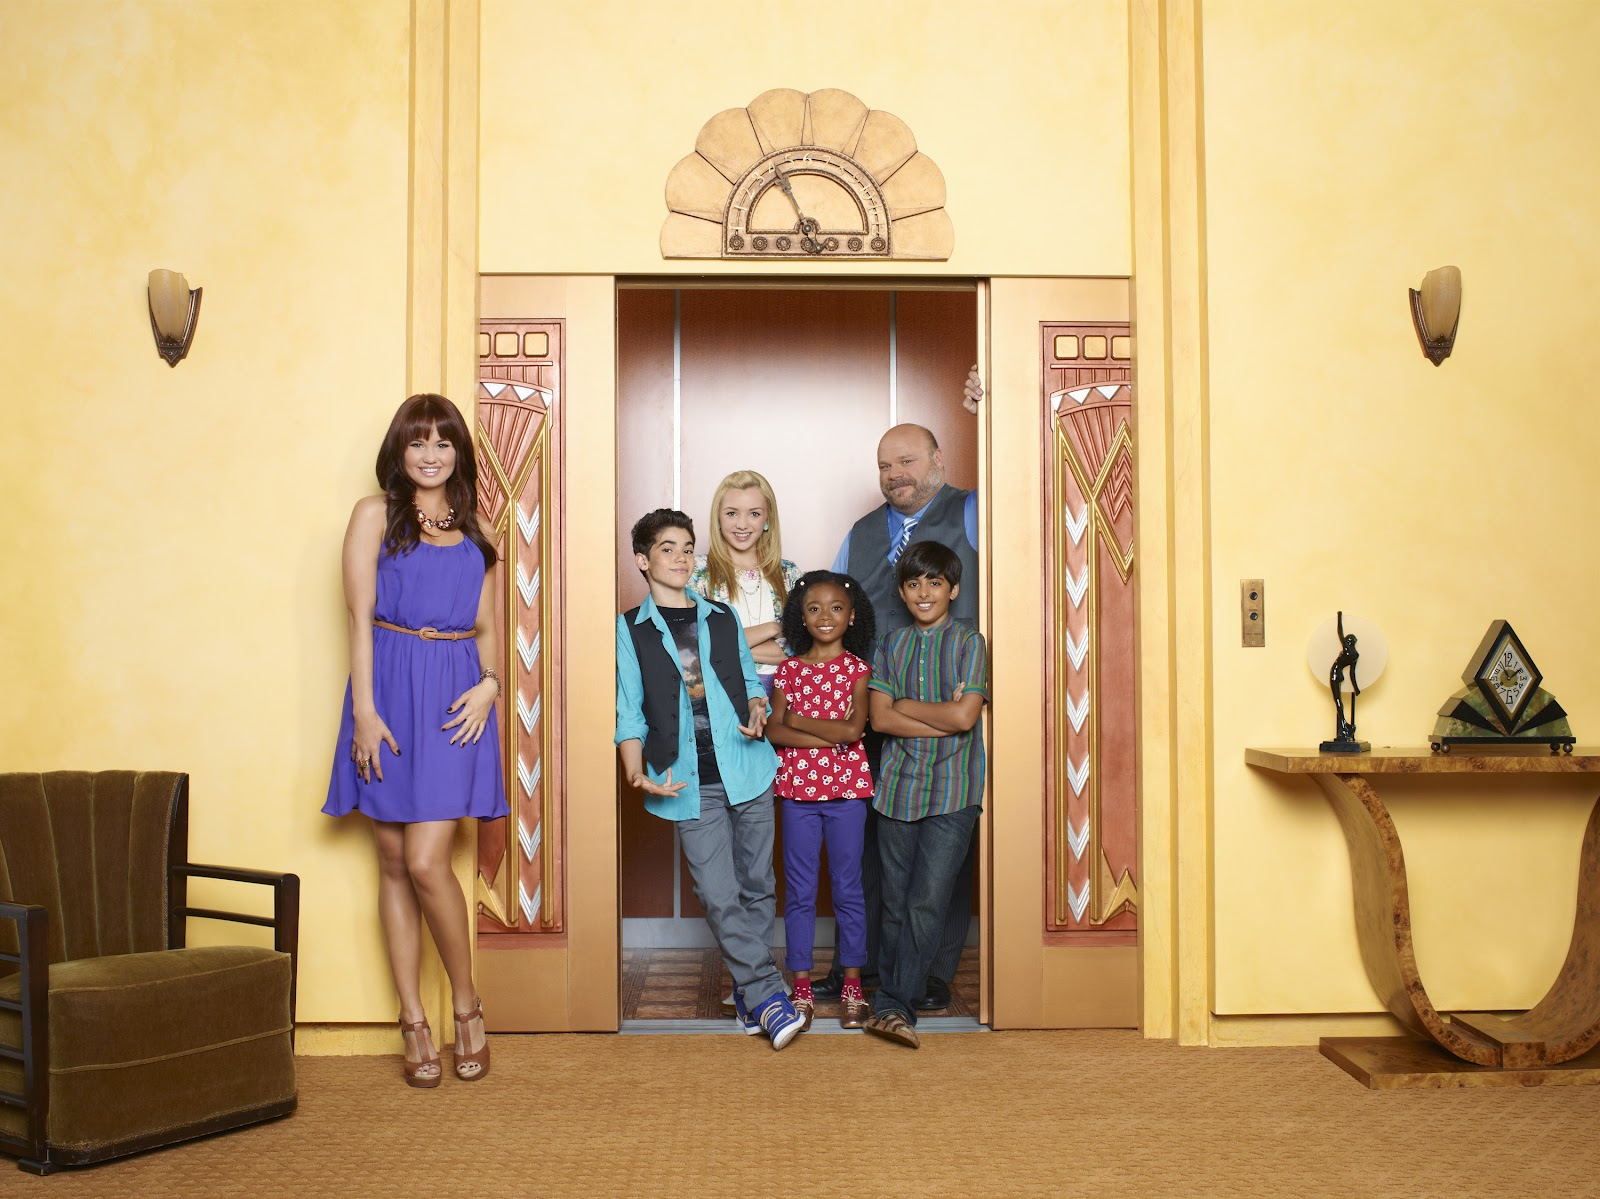 Jessie Wallpaper Disney Channel Jessie disney channel 1600x1199